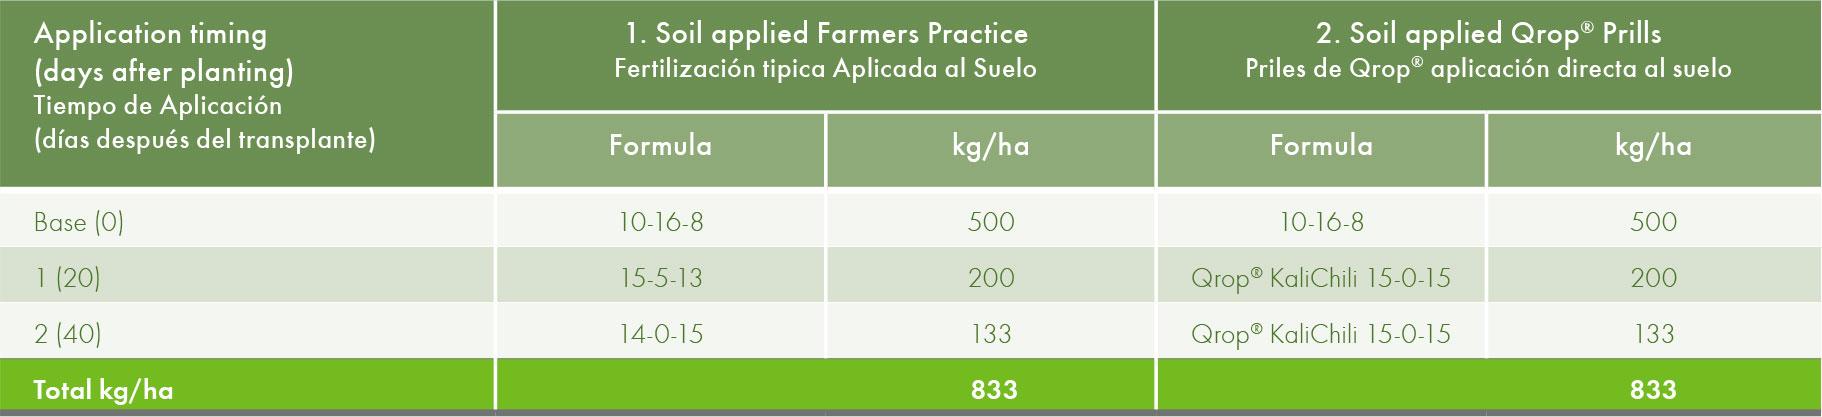 Soil applications with granular fertilisers or Qrop® prills.